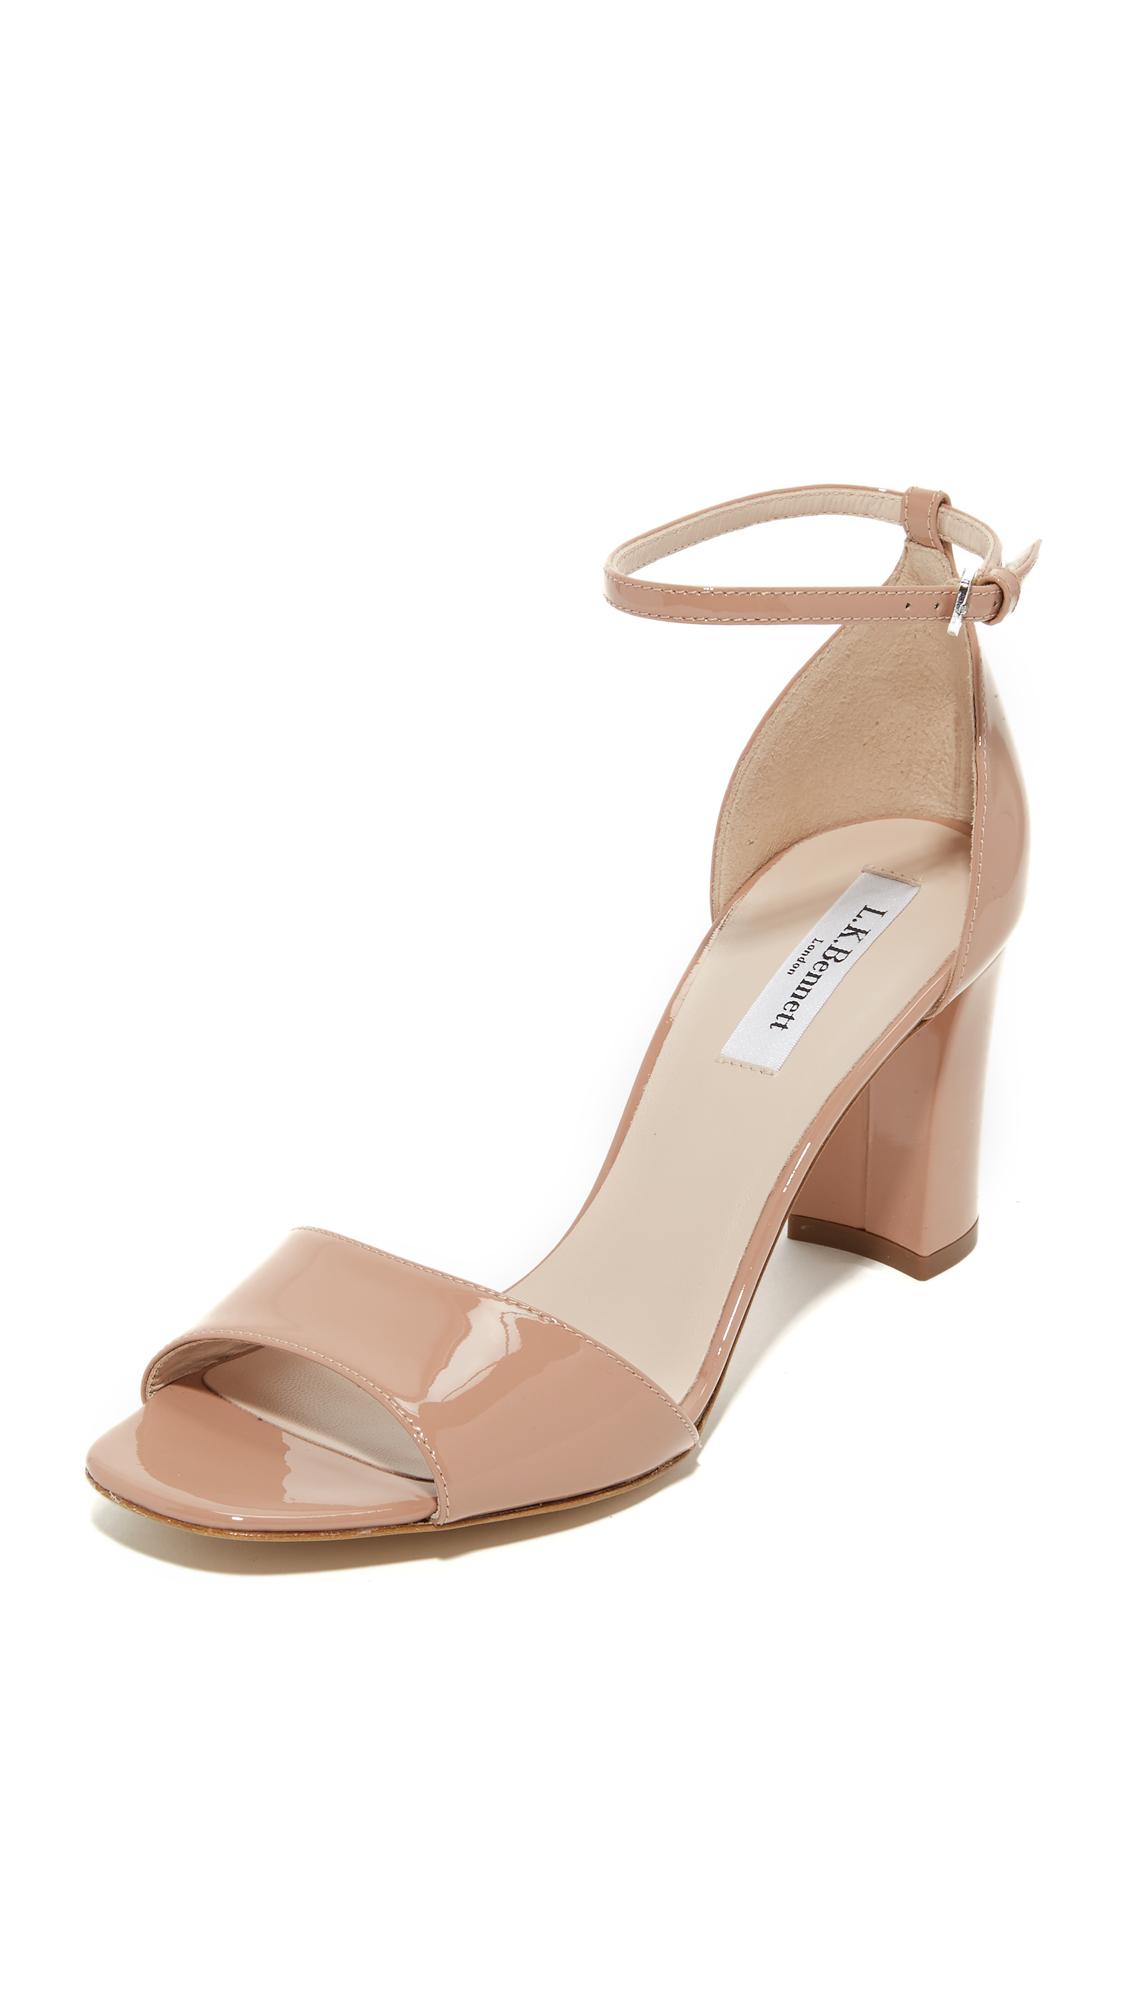 L K Bennett Helena Sandals Fawn Shoes Online Shopping At